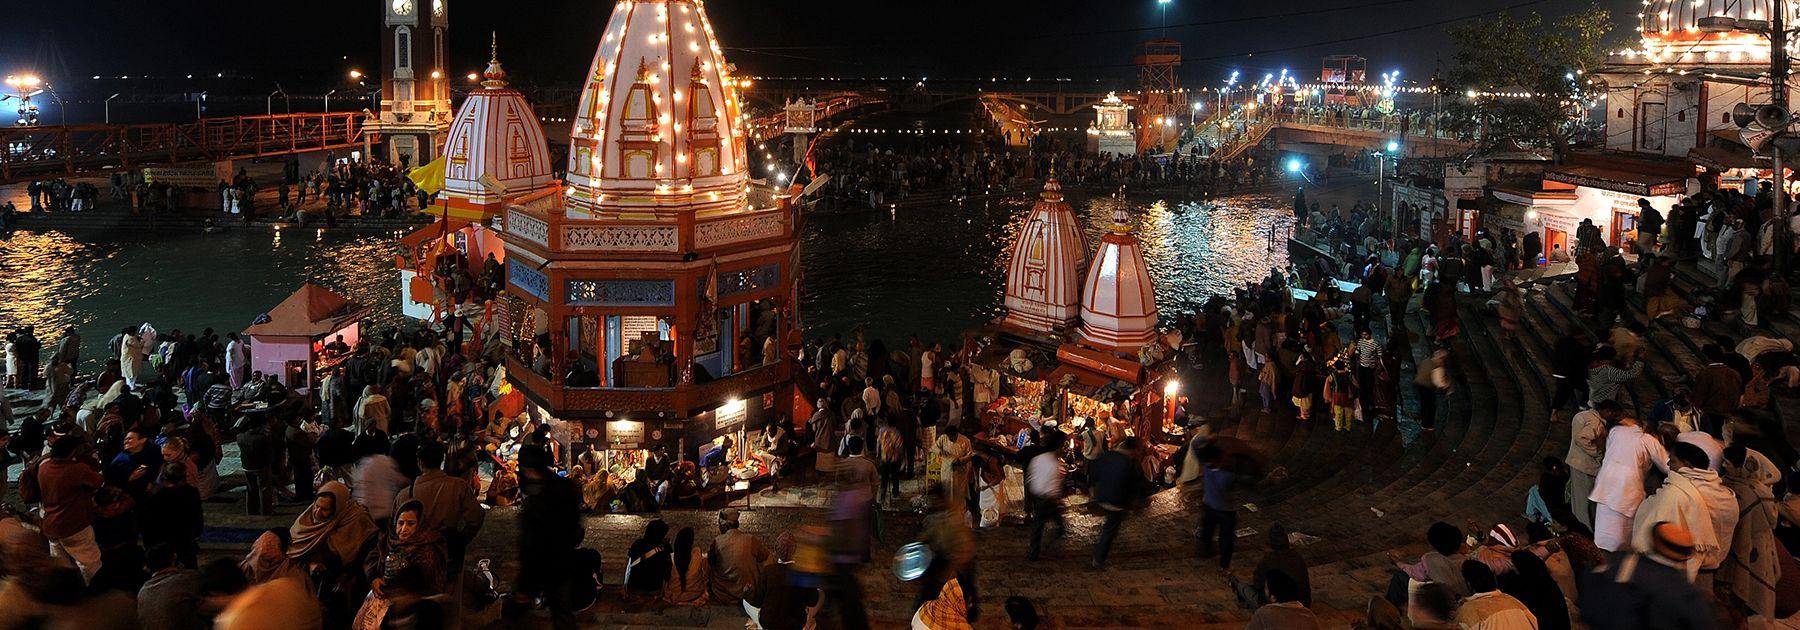 Hindu devotees perform evening prayers on the banks of the river Ganges on Makar Sankranti during the Kumbh Mela festival in Haridwar. (MANAN VATSYAYANA/AFP/Getty Images)